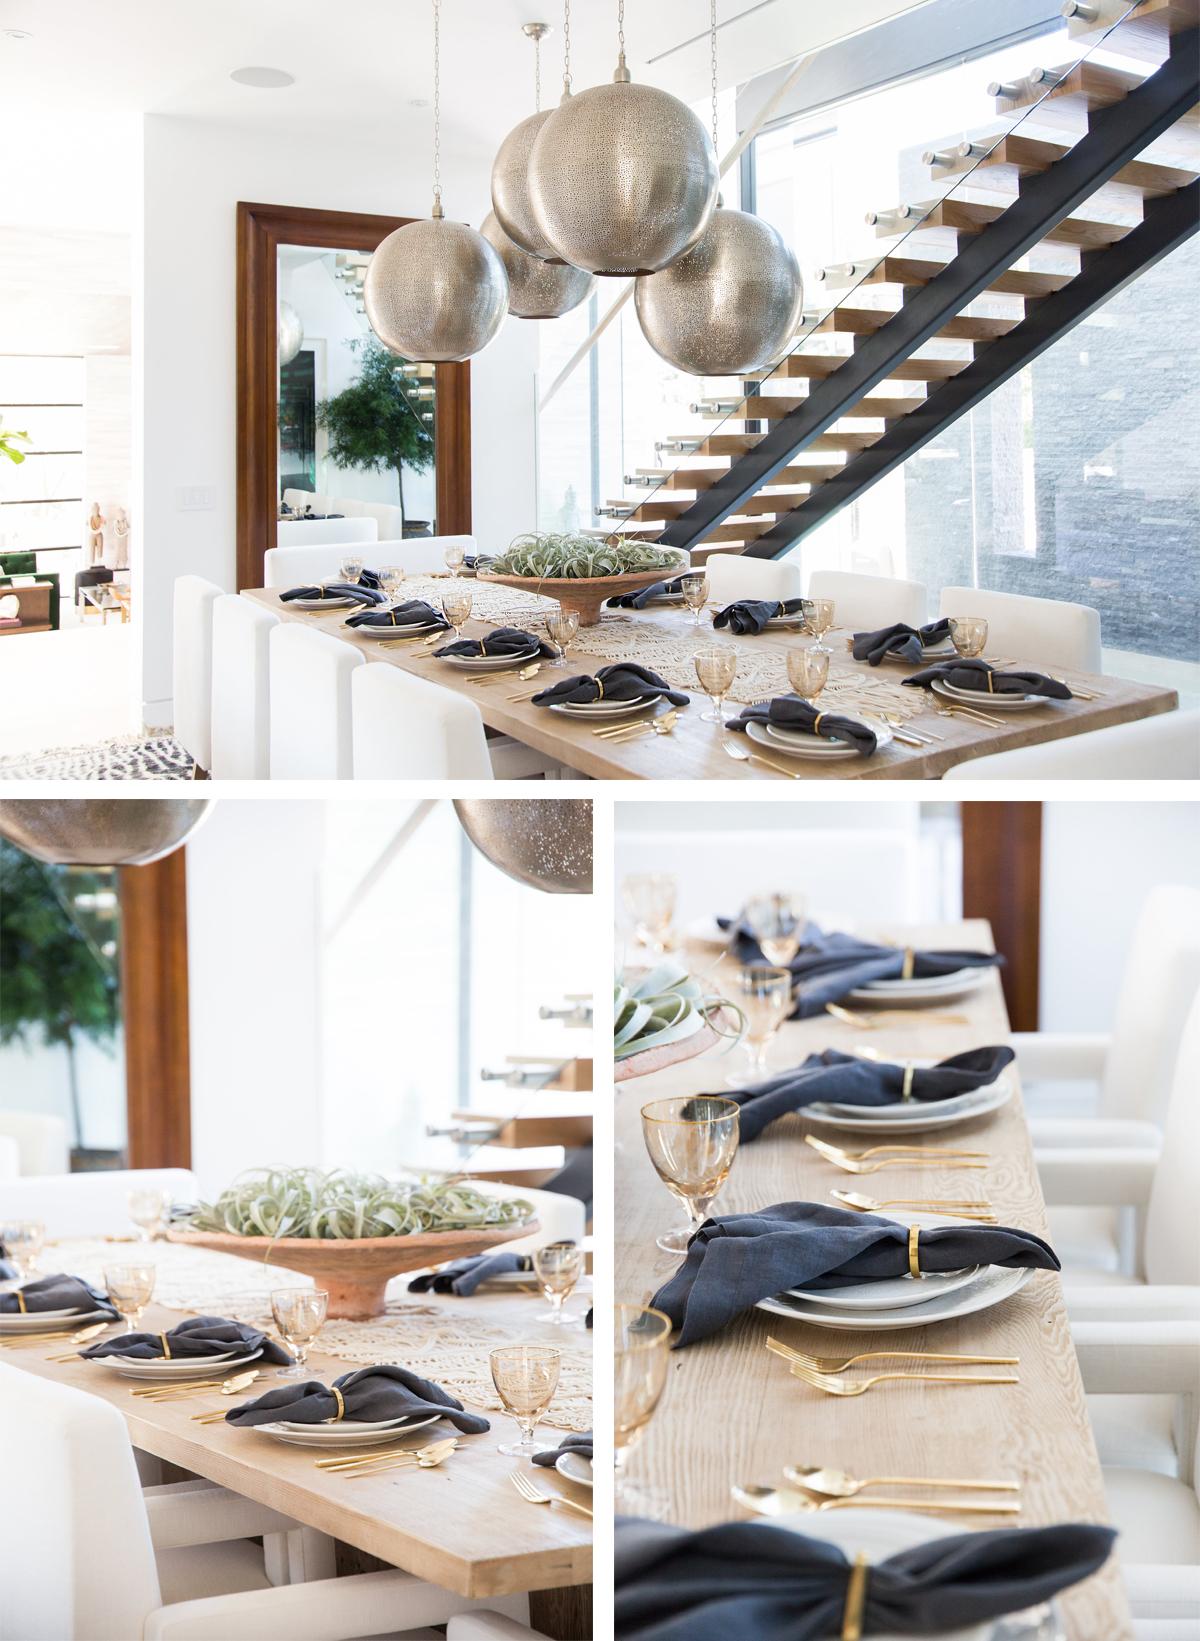 blackband_design_thanksgiving_tablescapes_bel_air